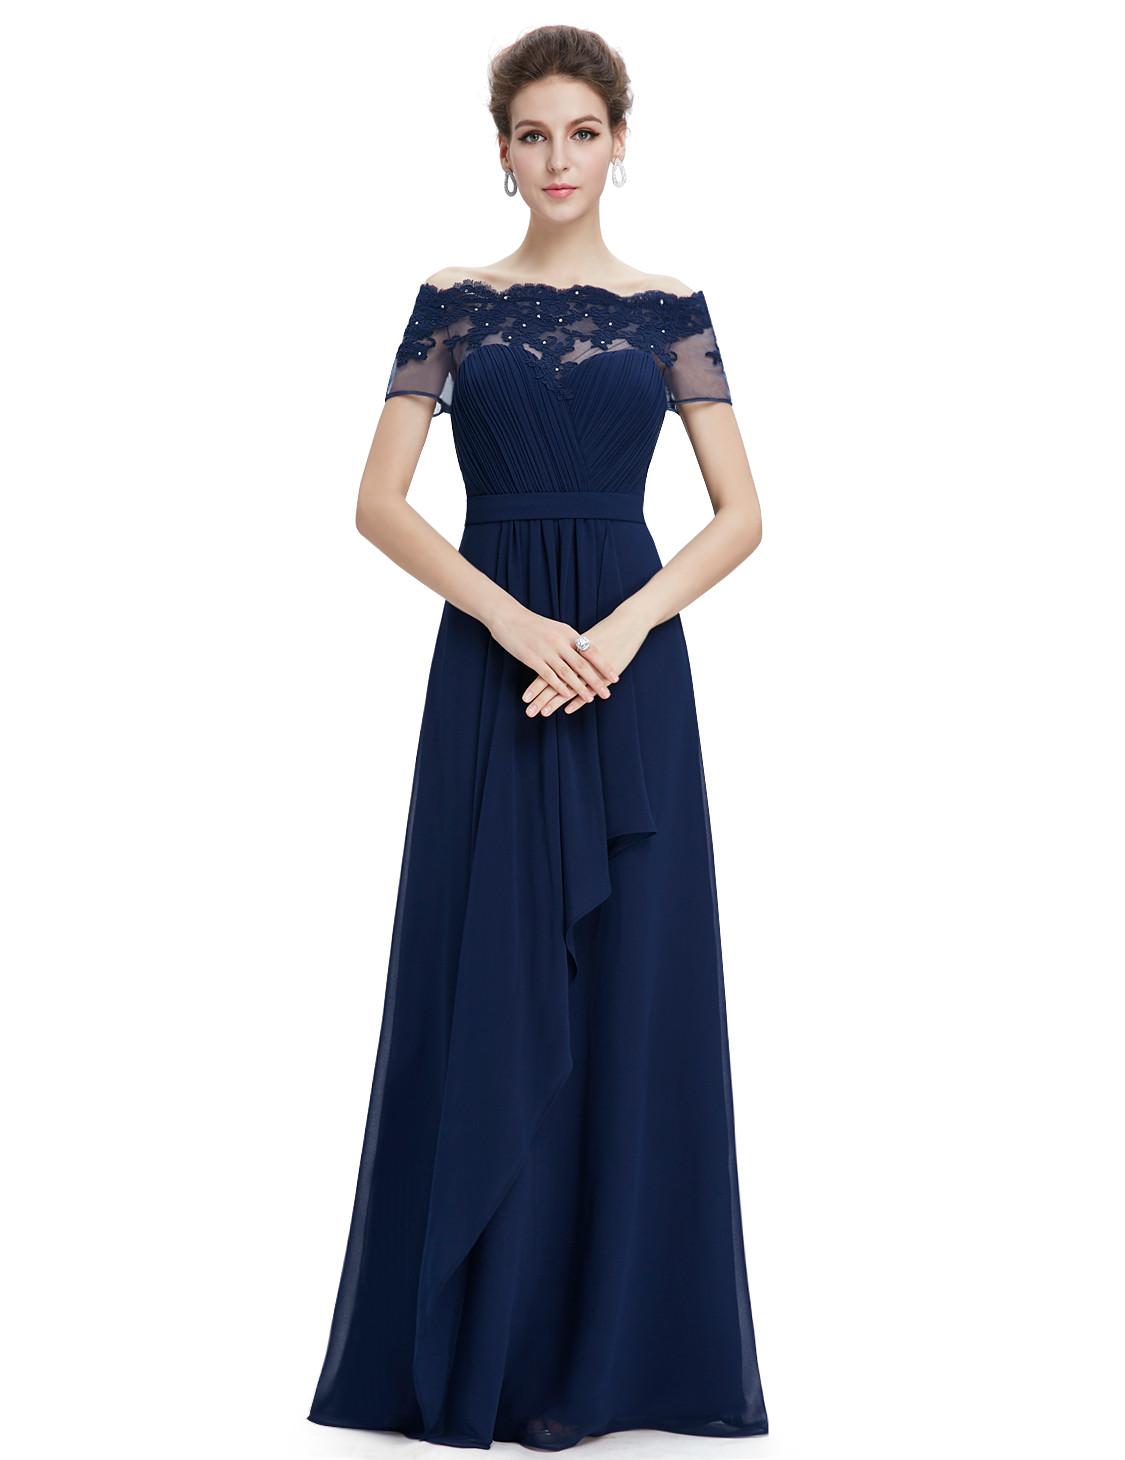 Boat Neck Navy Blue Lacy Bridesmaid Dress UK